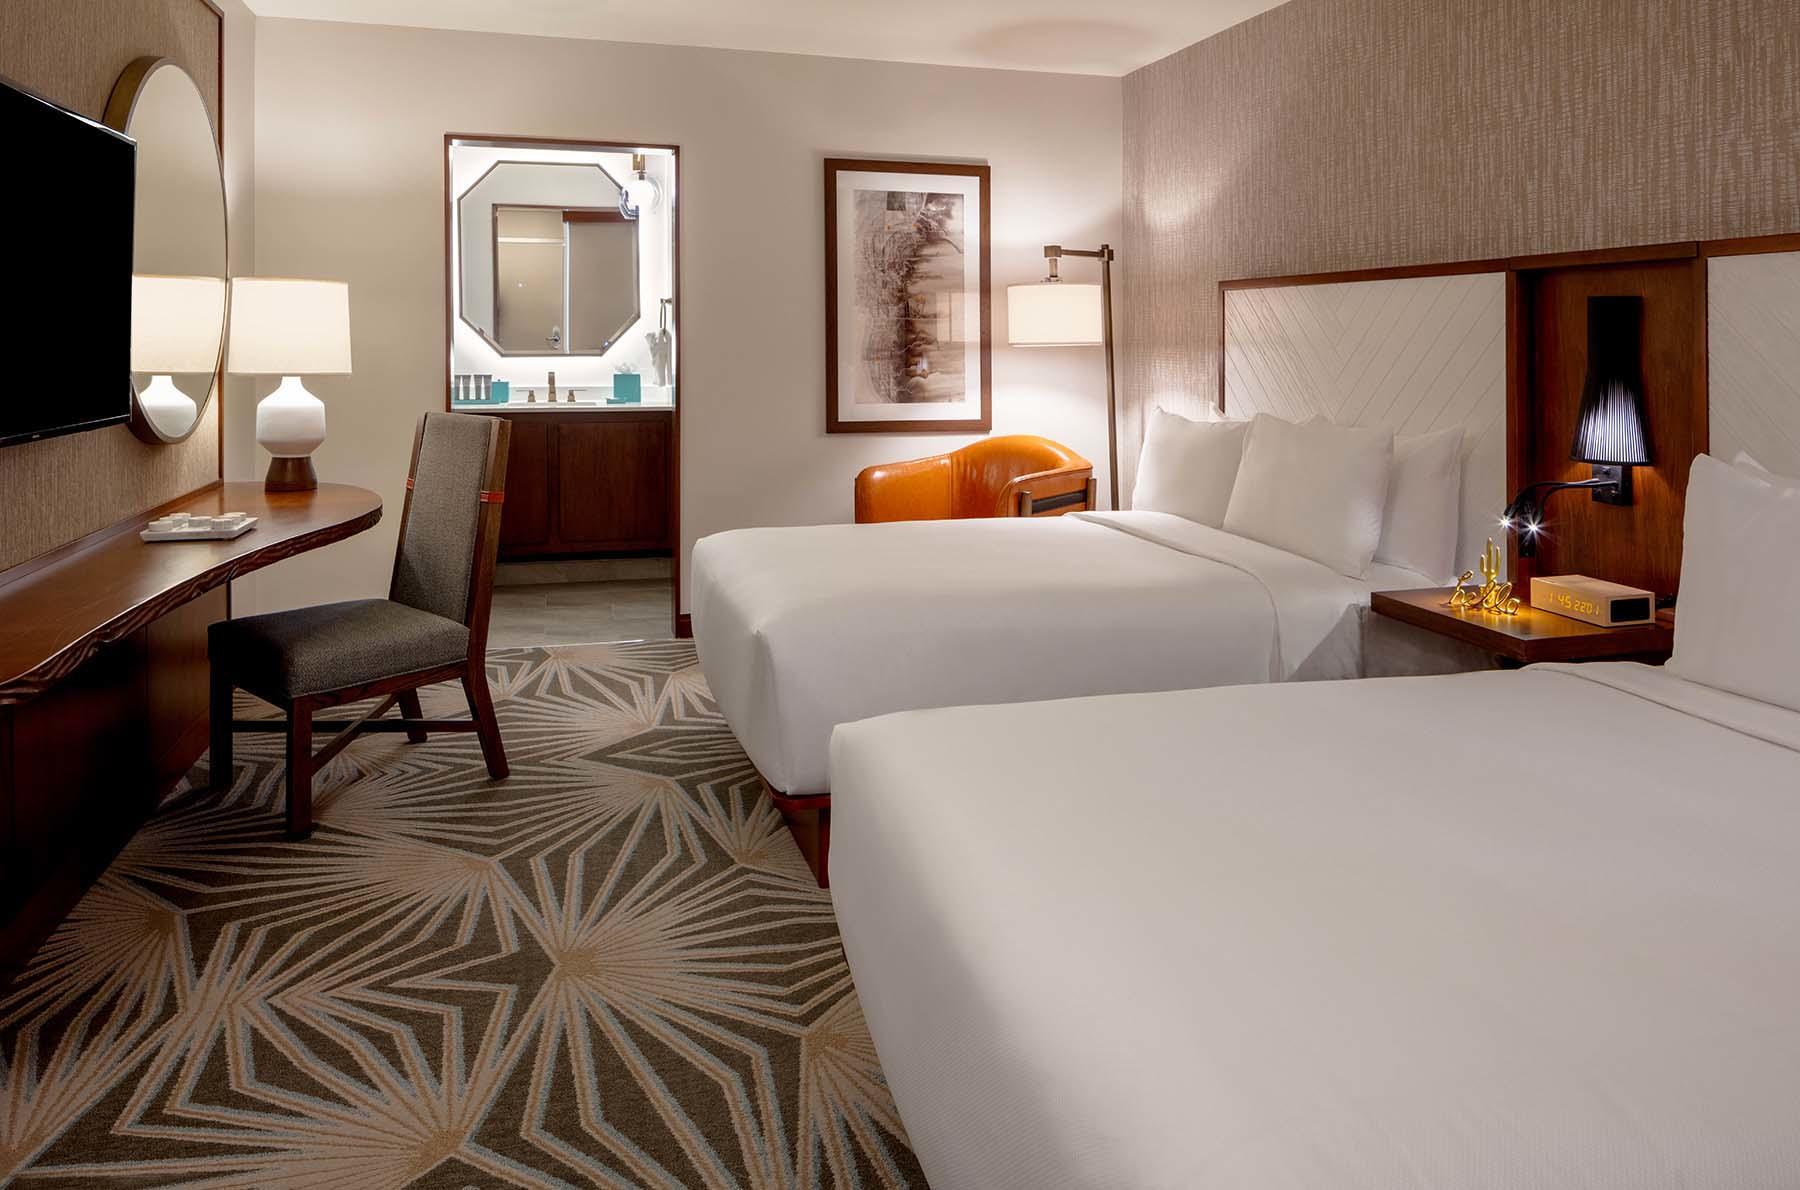 Hotel Adeline image 14